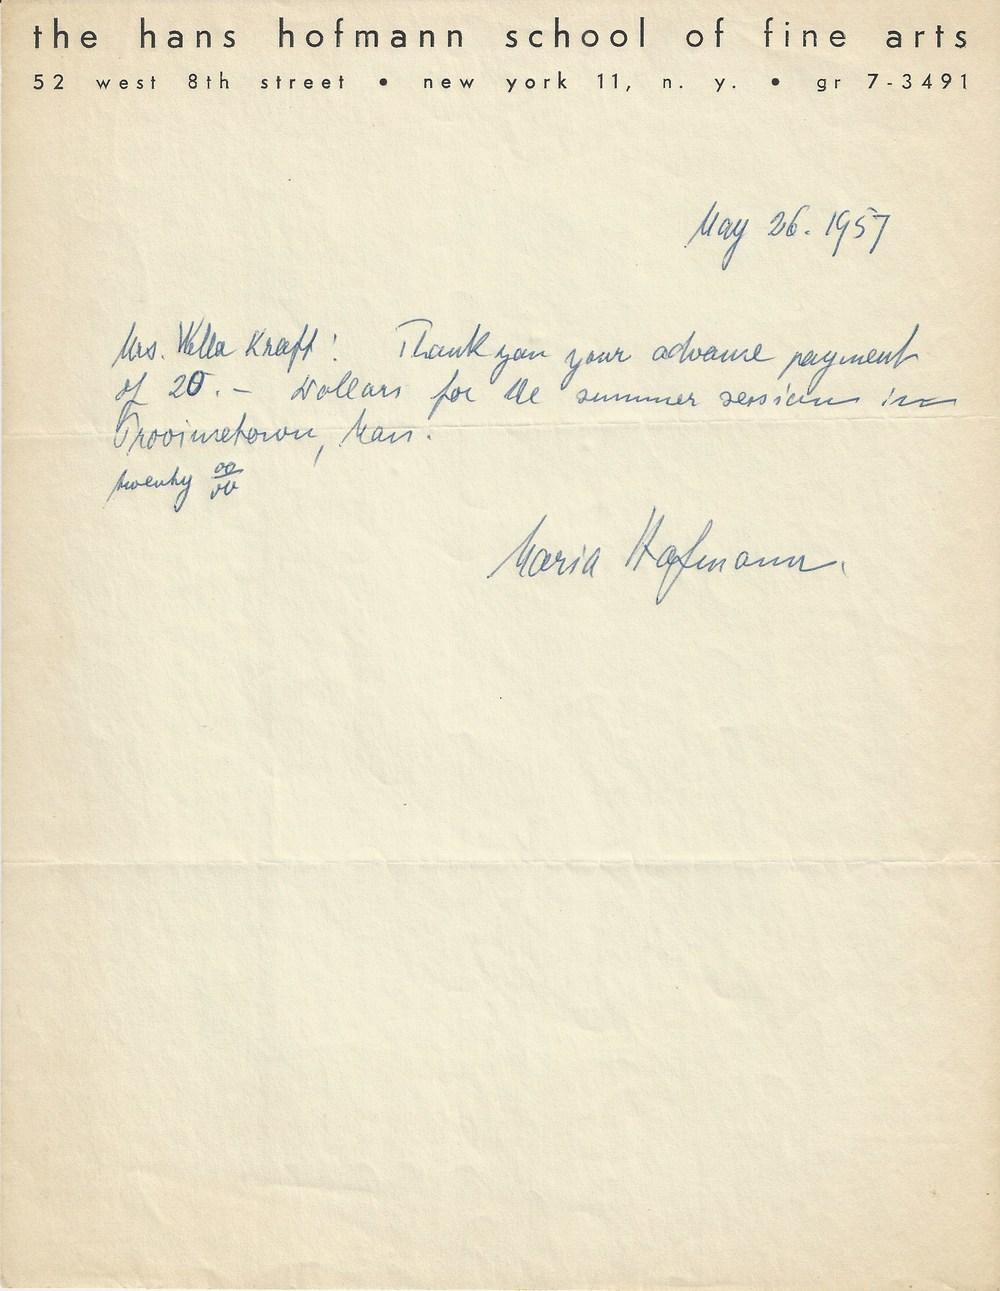 Receipt from Maria Hofmann to Nela Arias dated 1957